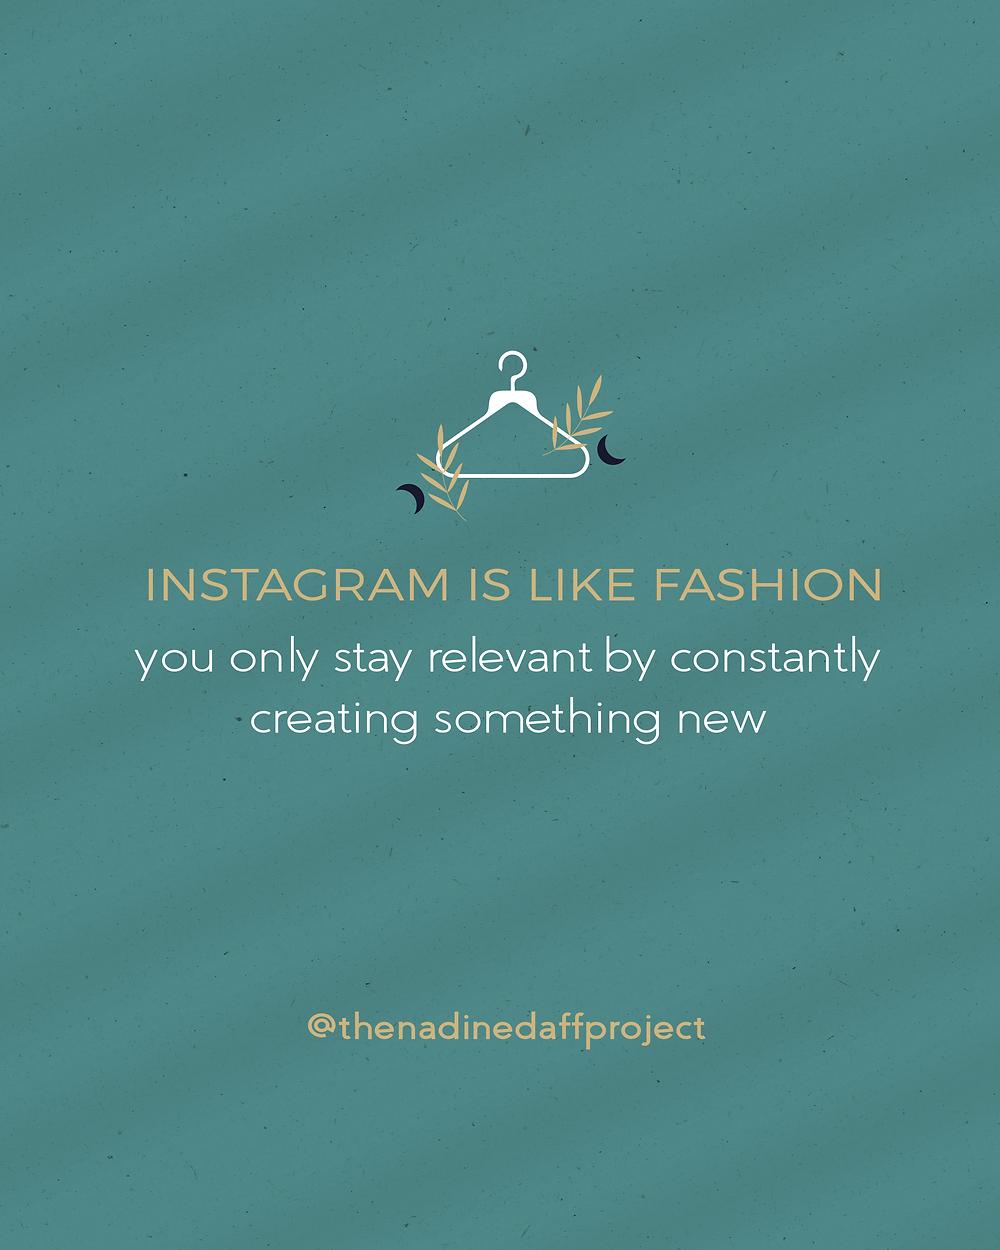 Instagram marketing tip